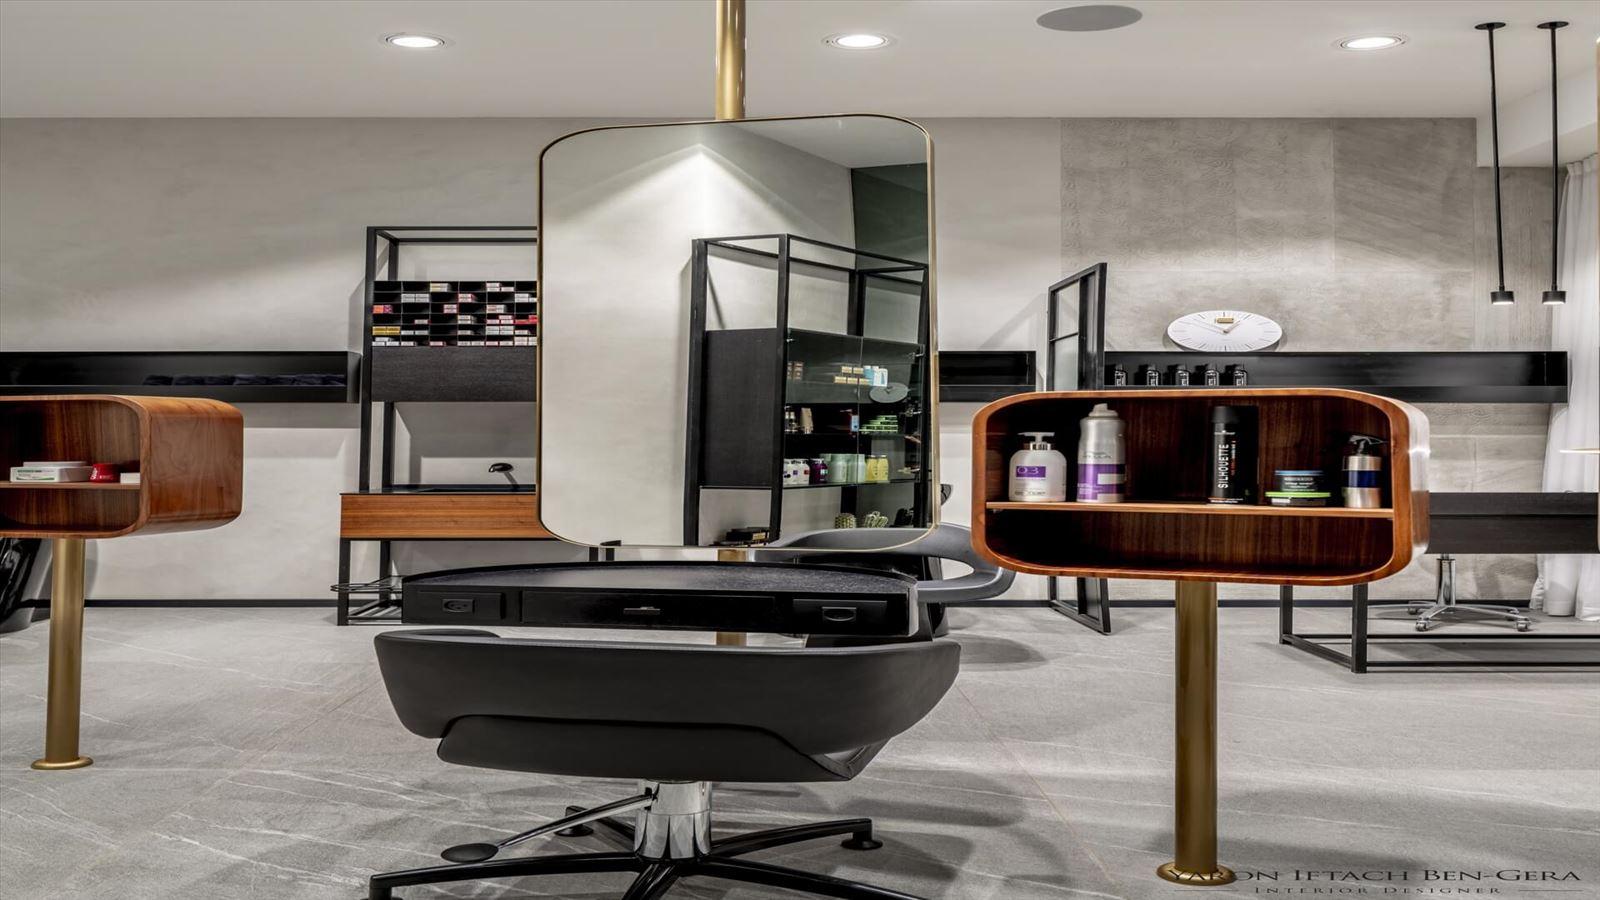 Boutique Hair Dressing Salon פרויקט תאורה במספרה על ידי דורי קמחי